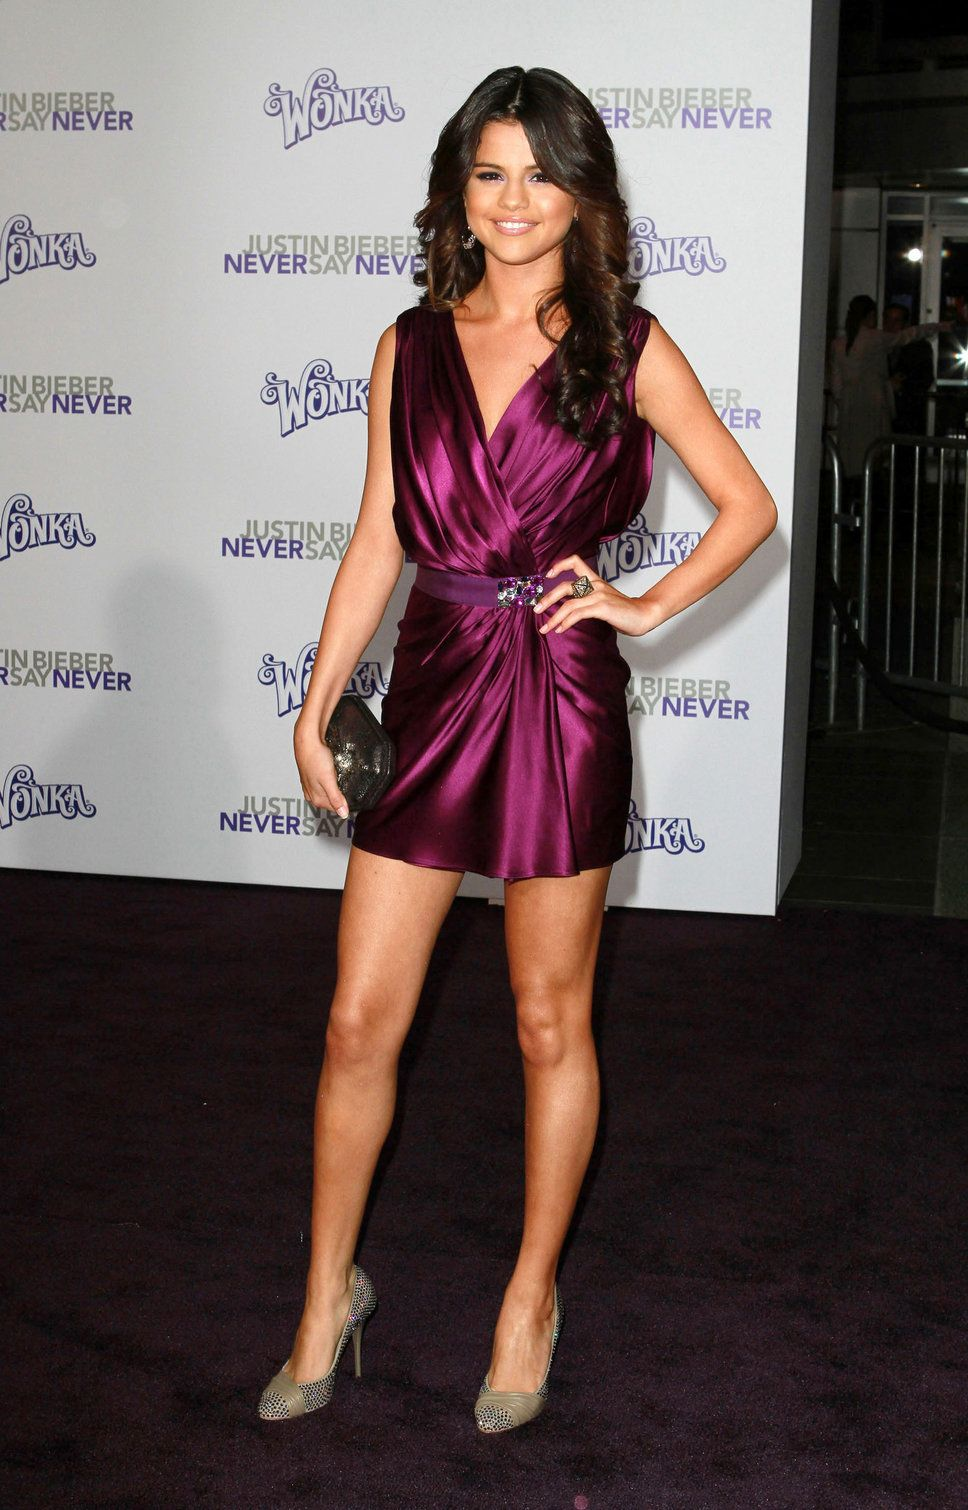 ¿Cuánto mide Selena Gomez? Real height 28e9002adef2bf5ed1951716f3b07c2d